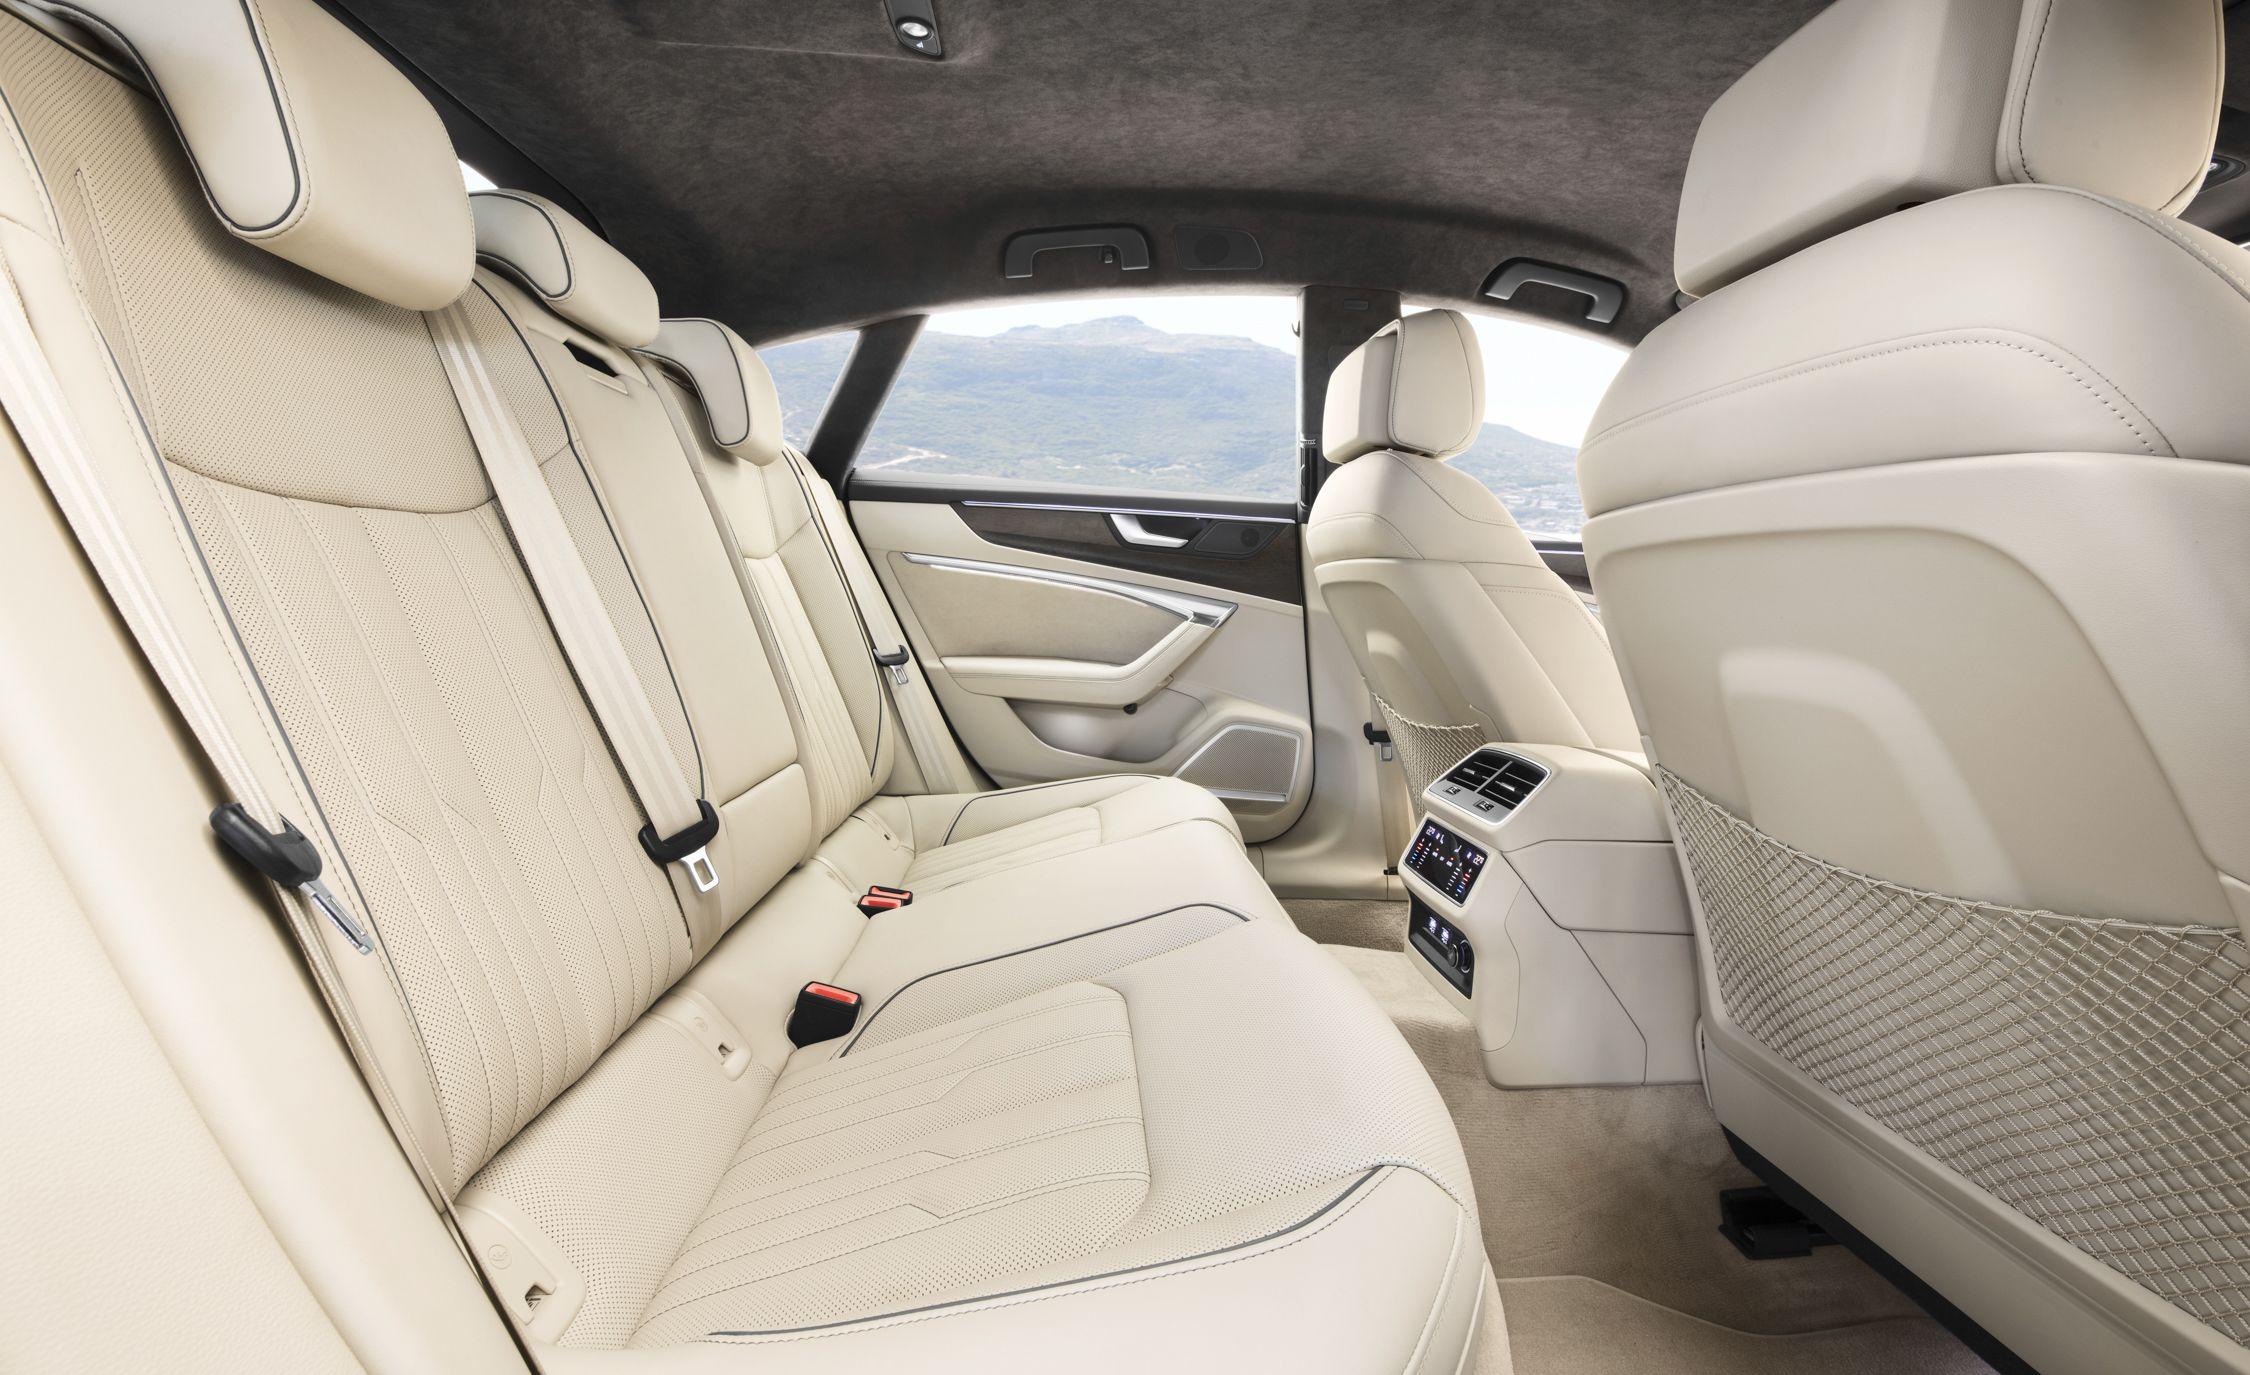 2019-Audi-A7-Sportback-182-1.jpg